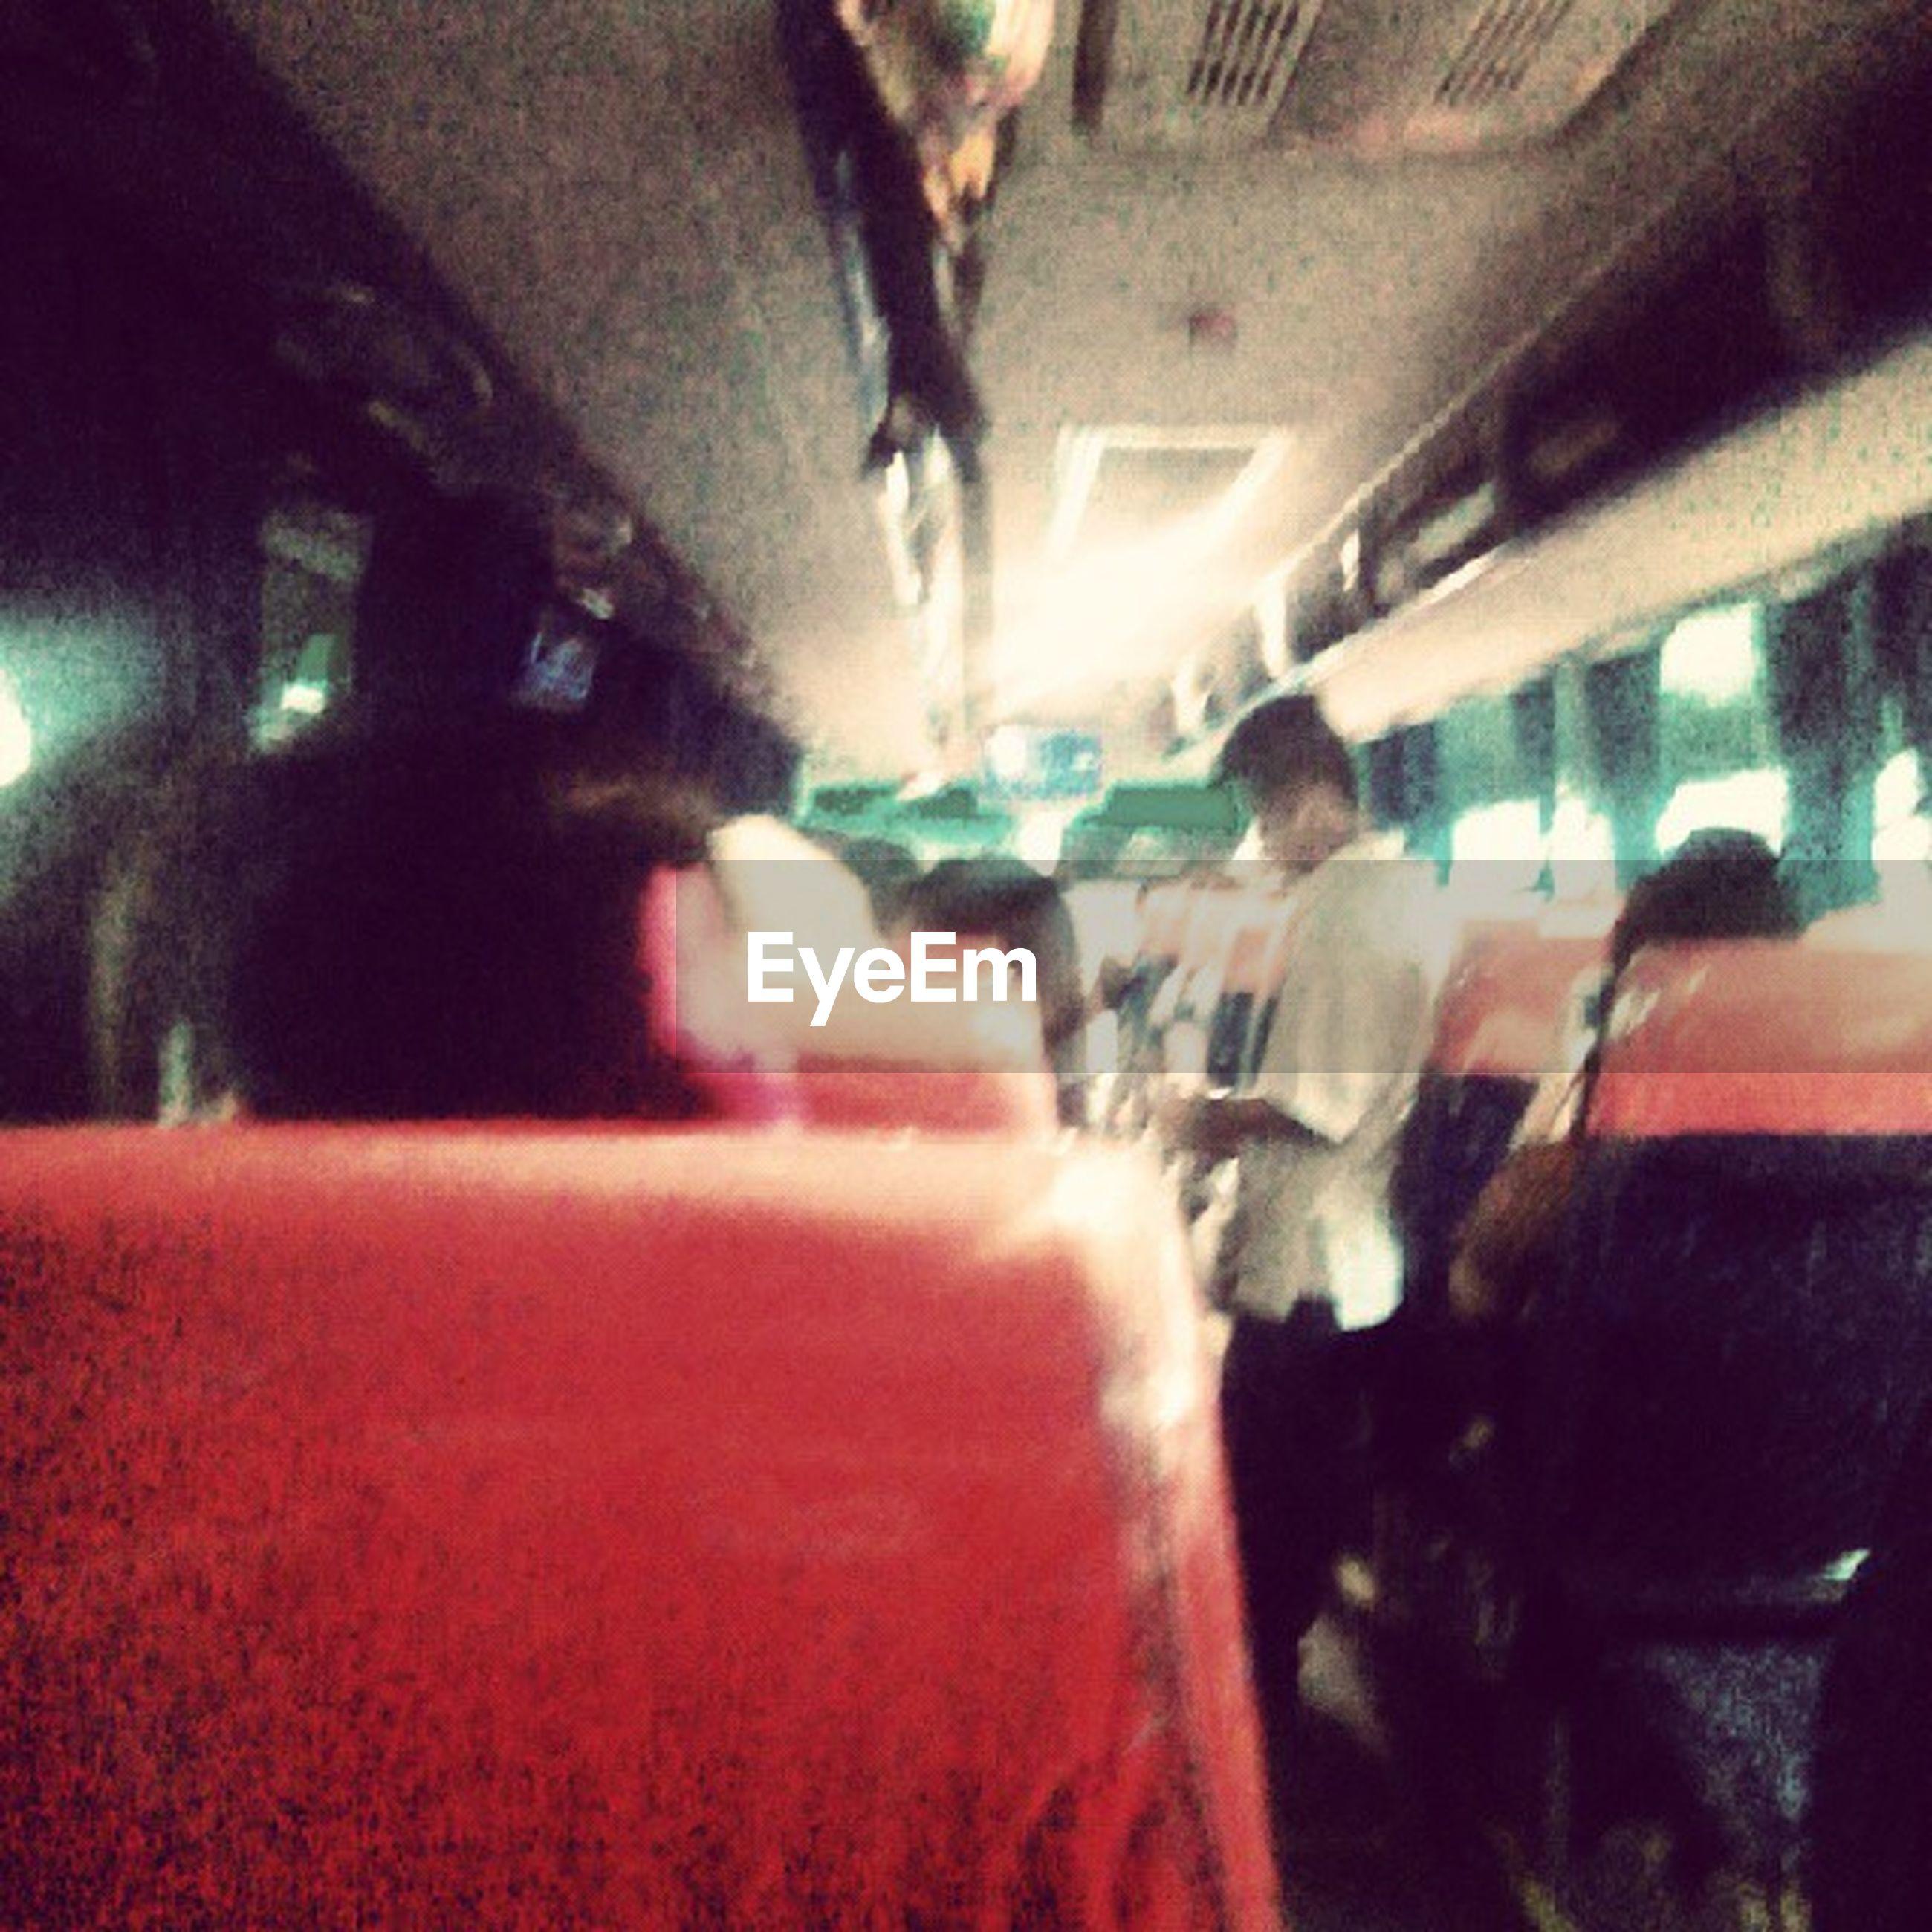 transportation, mode of transport, land vehicle, car, lifestyles, men, vehicle interior, travel, illuminated, incidental people, blurred motion, leisure activity, person, city life, street, on the move, night, public transportation